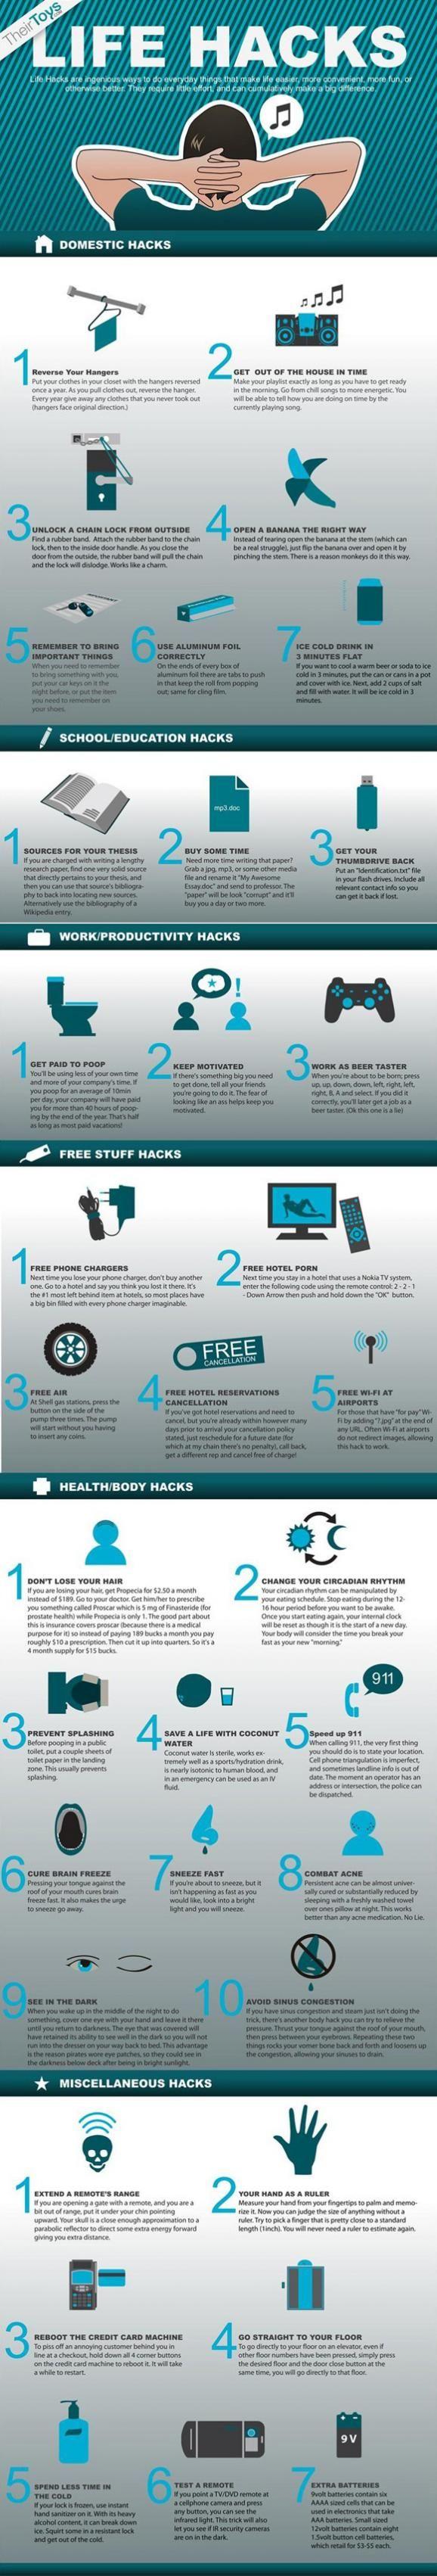 Amazing life hacks (Infographic) | ScienceDump